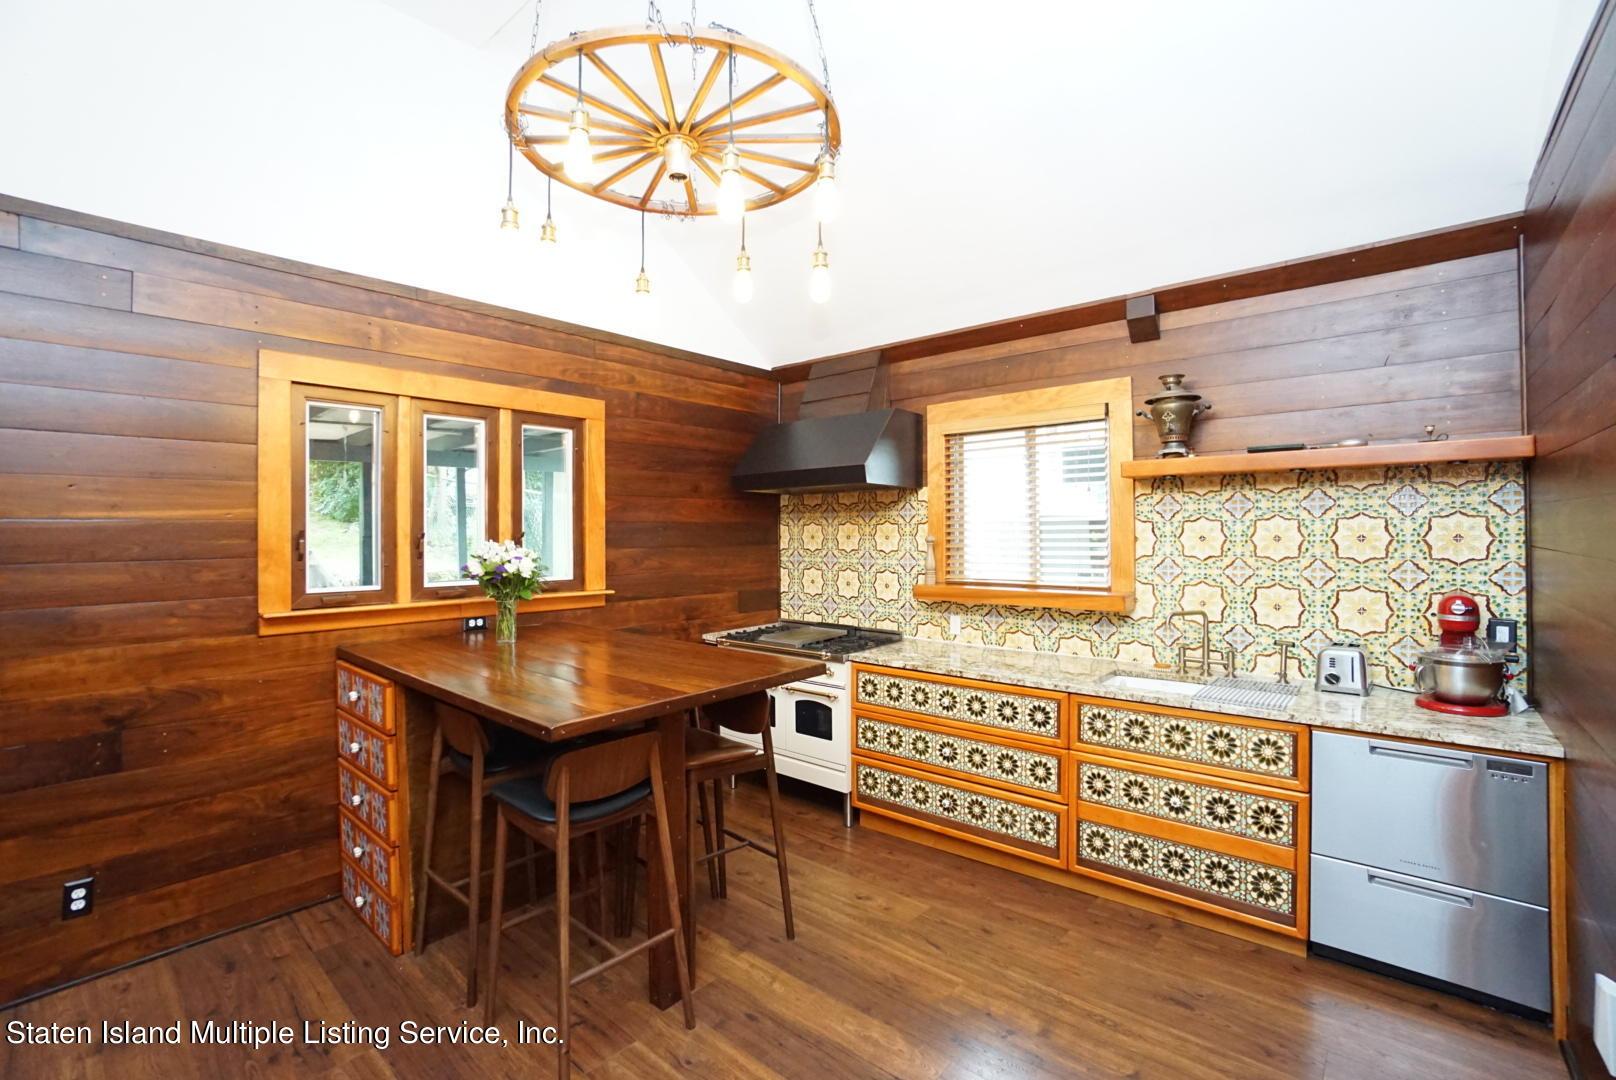 Single Family - Detached 136 York Avenue  Staten Island, NY 10301, MLS-1147575-17